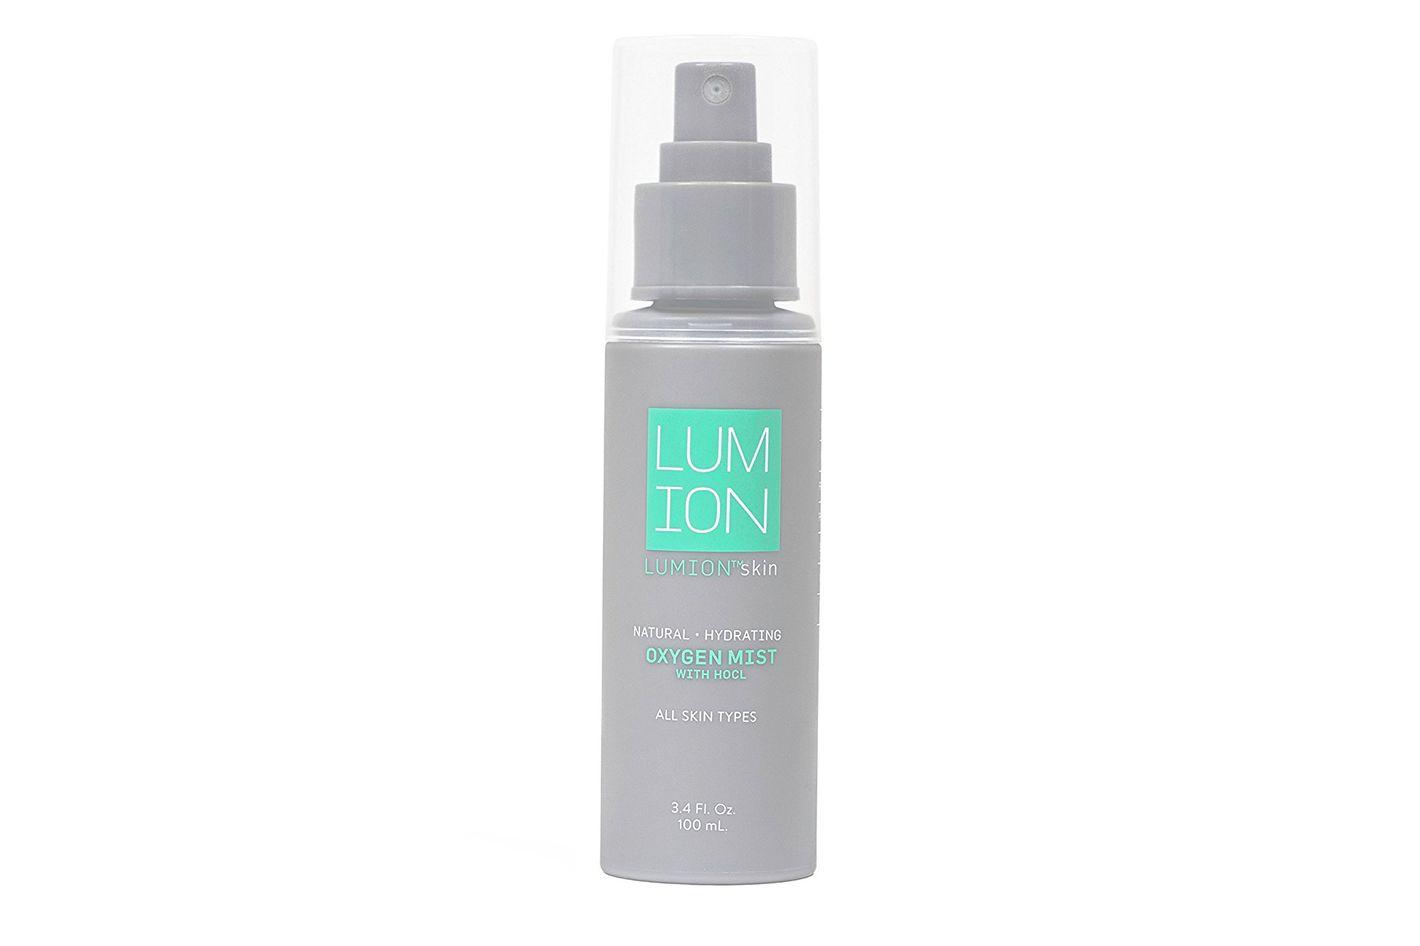 Lumion Skin Oxygen Mist + HOCL